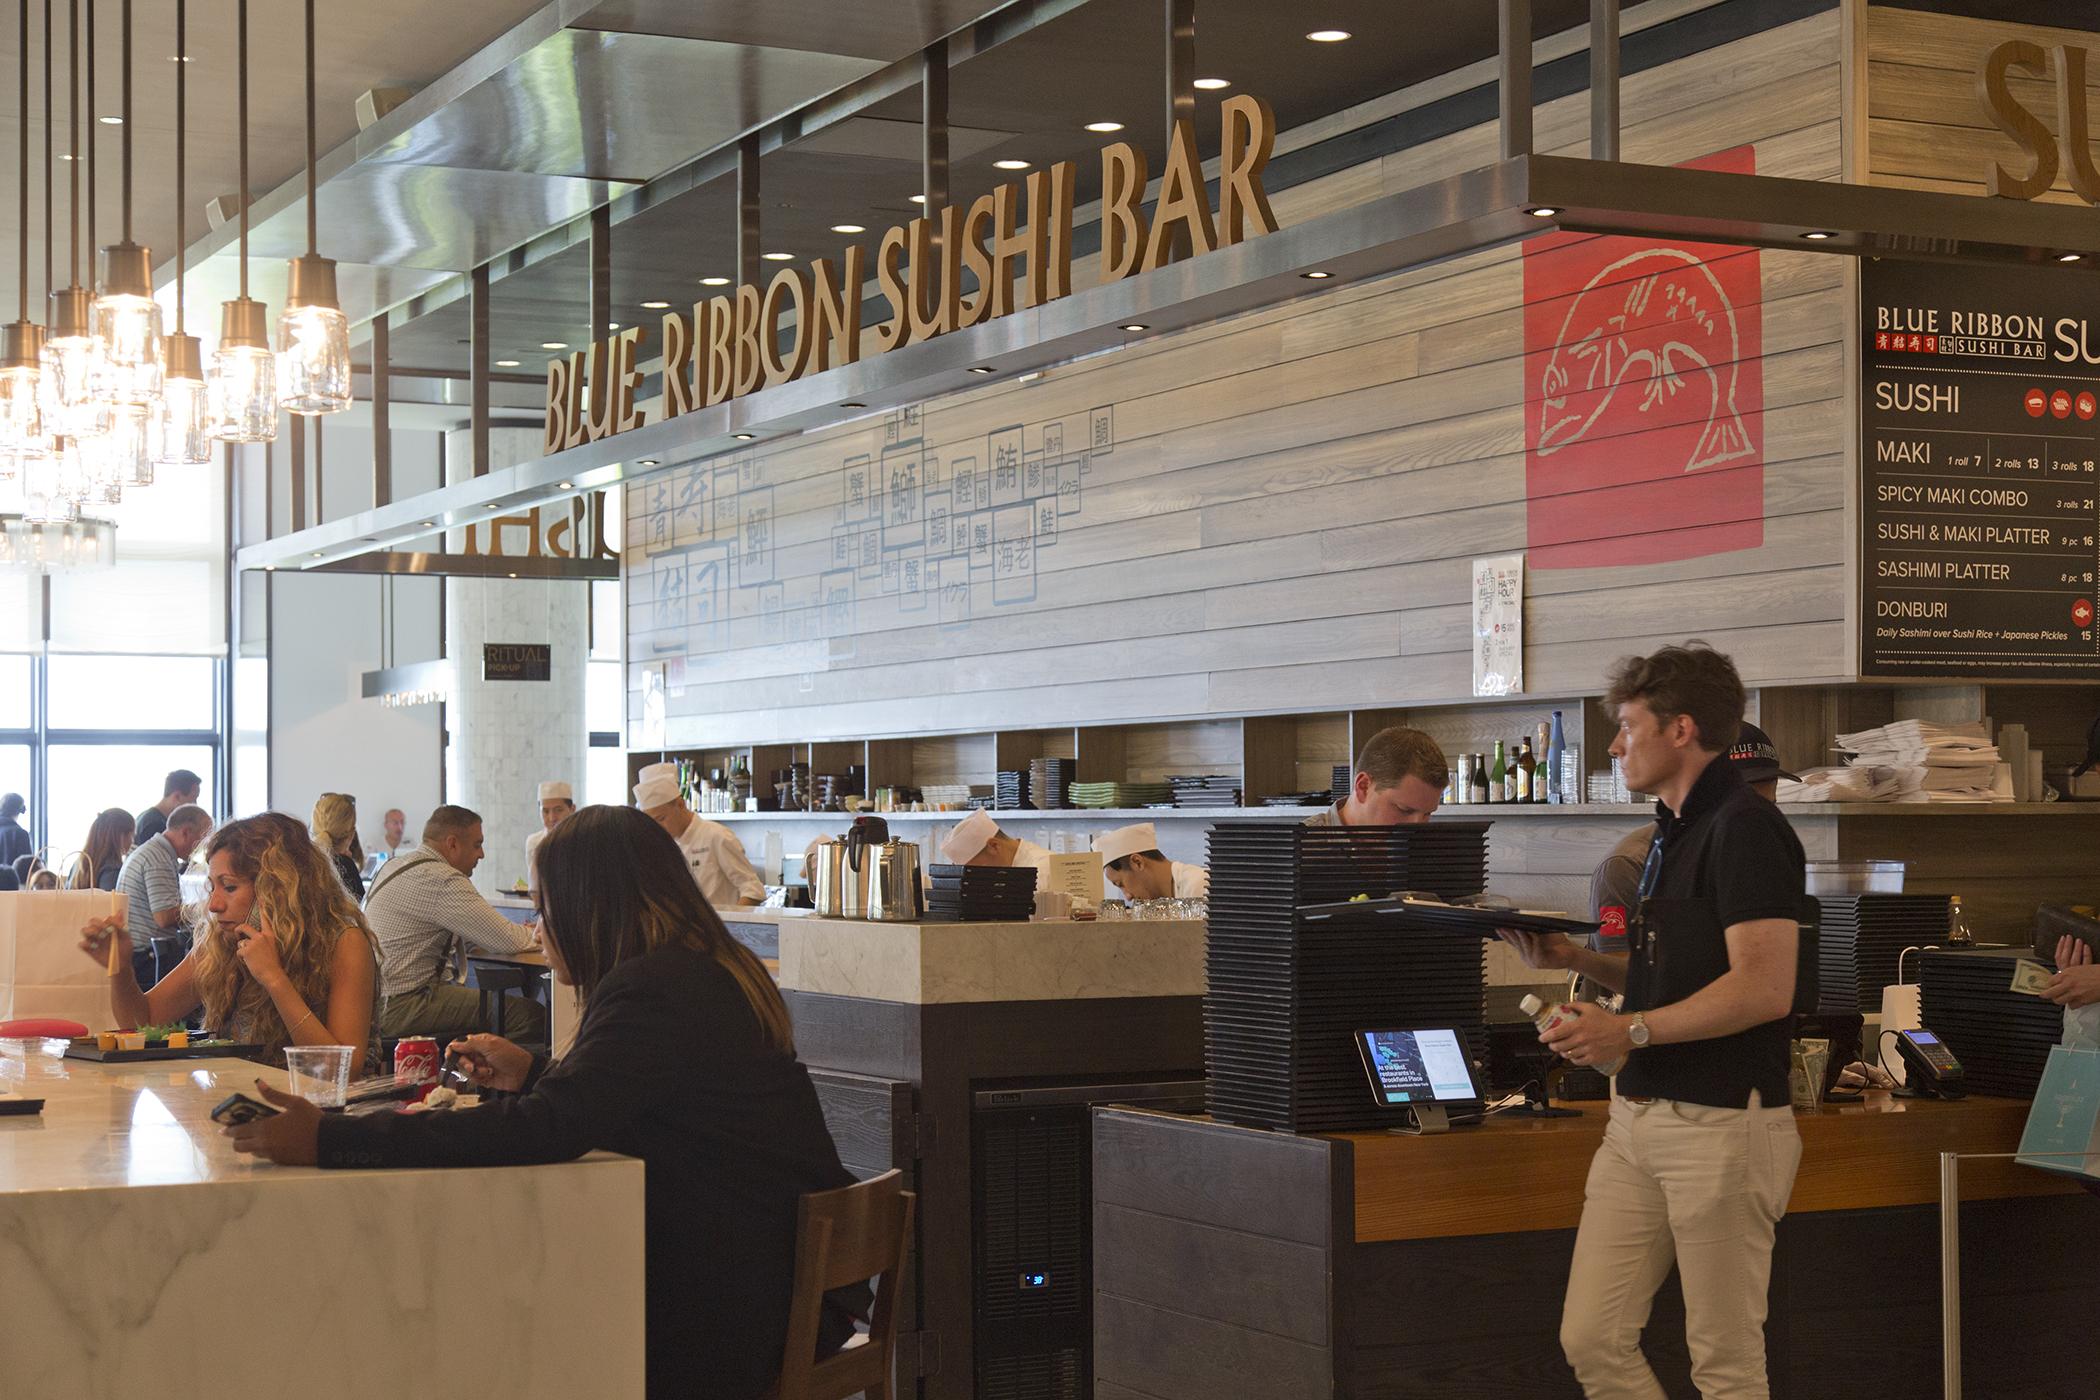 Blue Ribbon Sushi Bar inside of Hudson Eats food court, Brookfield Place, New York.